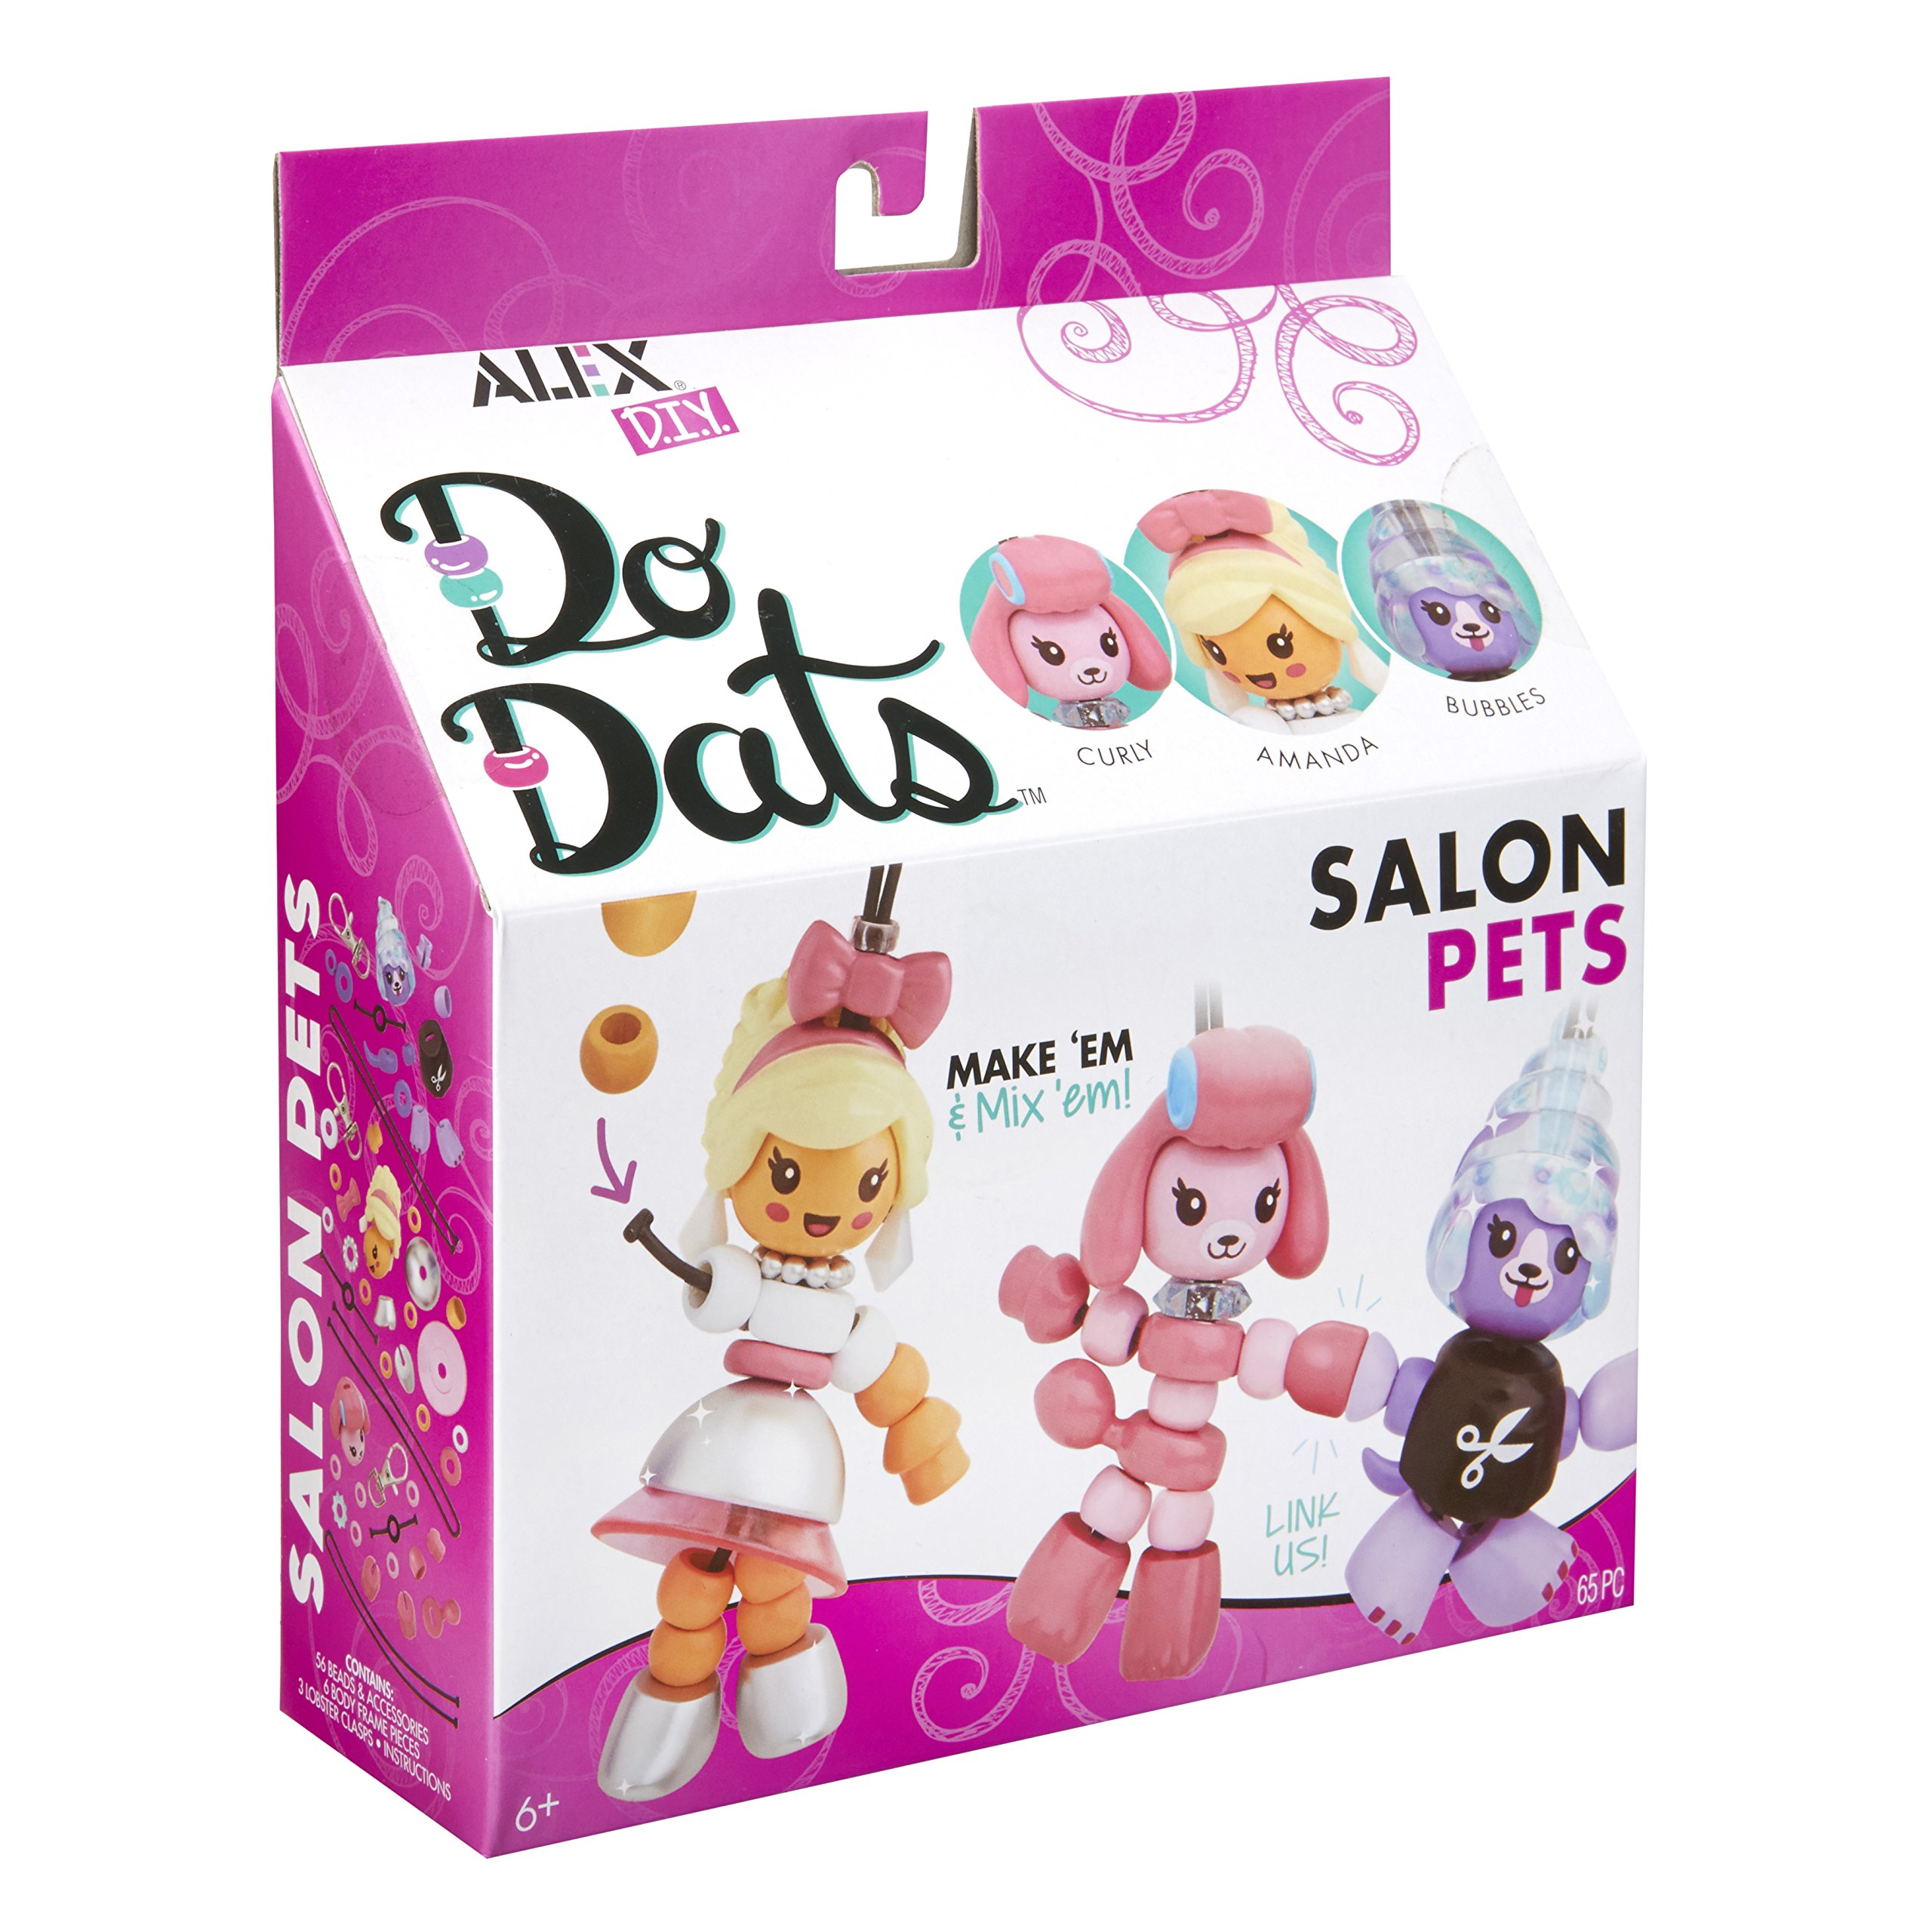 Alex DIY Do Dats Salon Pets Kids Art and Craft Activity